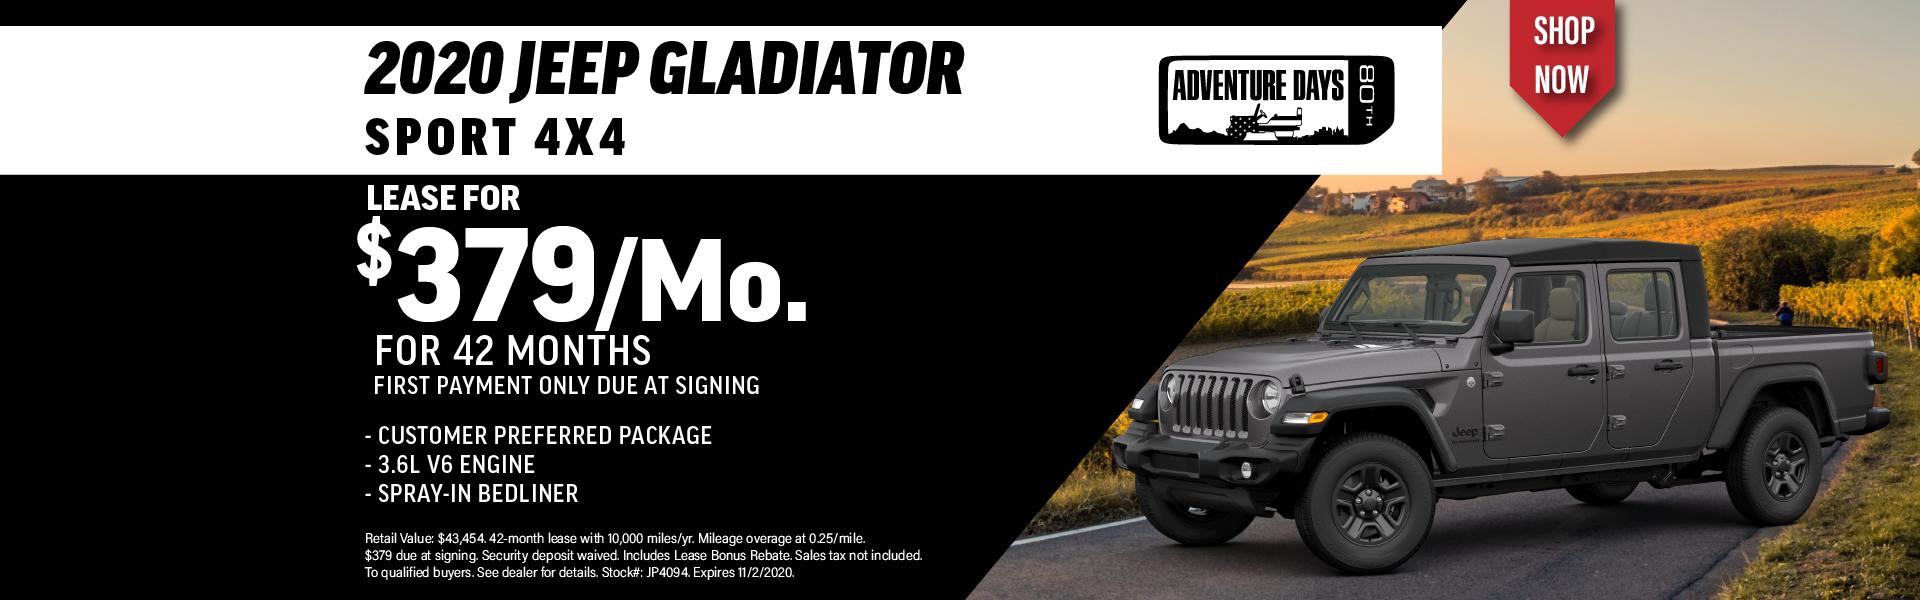 Quirk 2020 Jeep Gladiator- October 2020